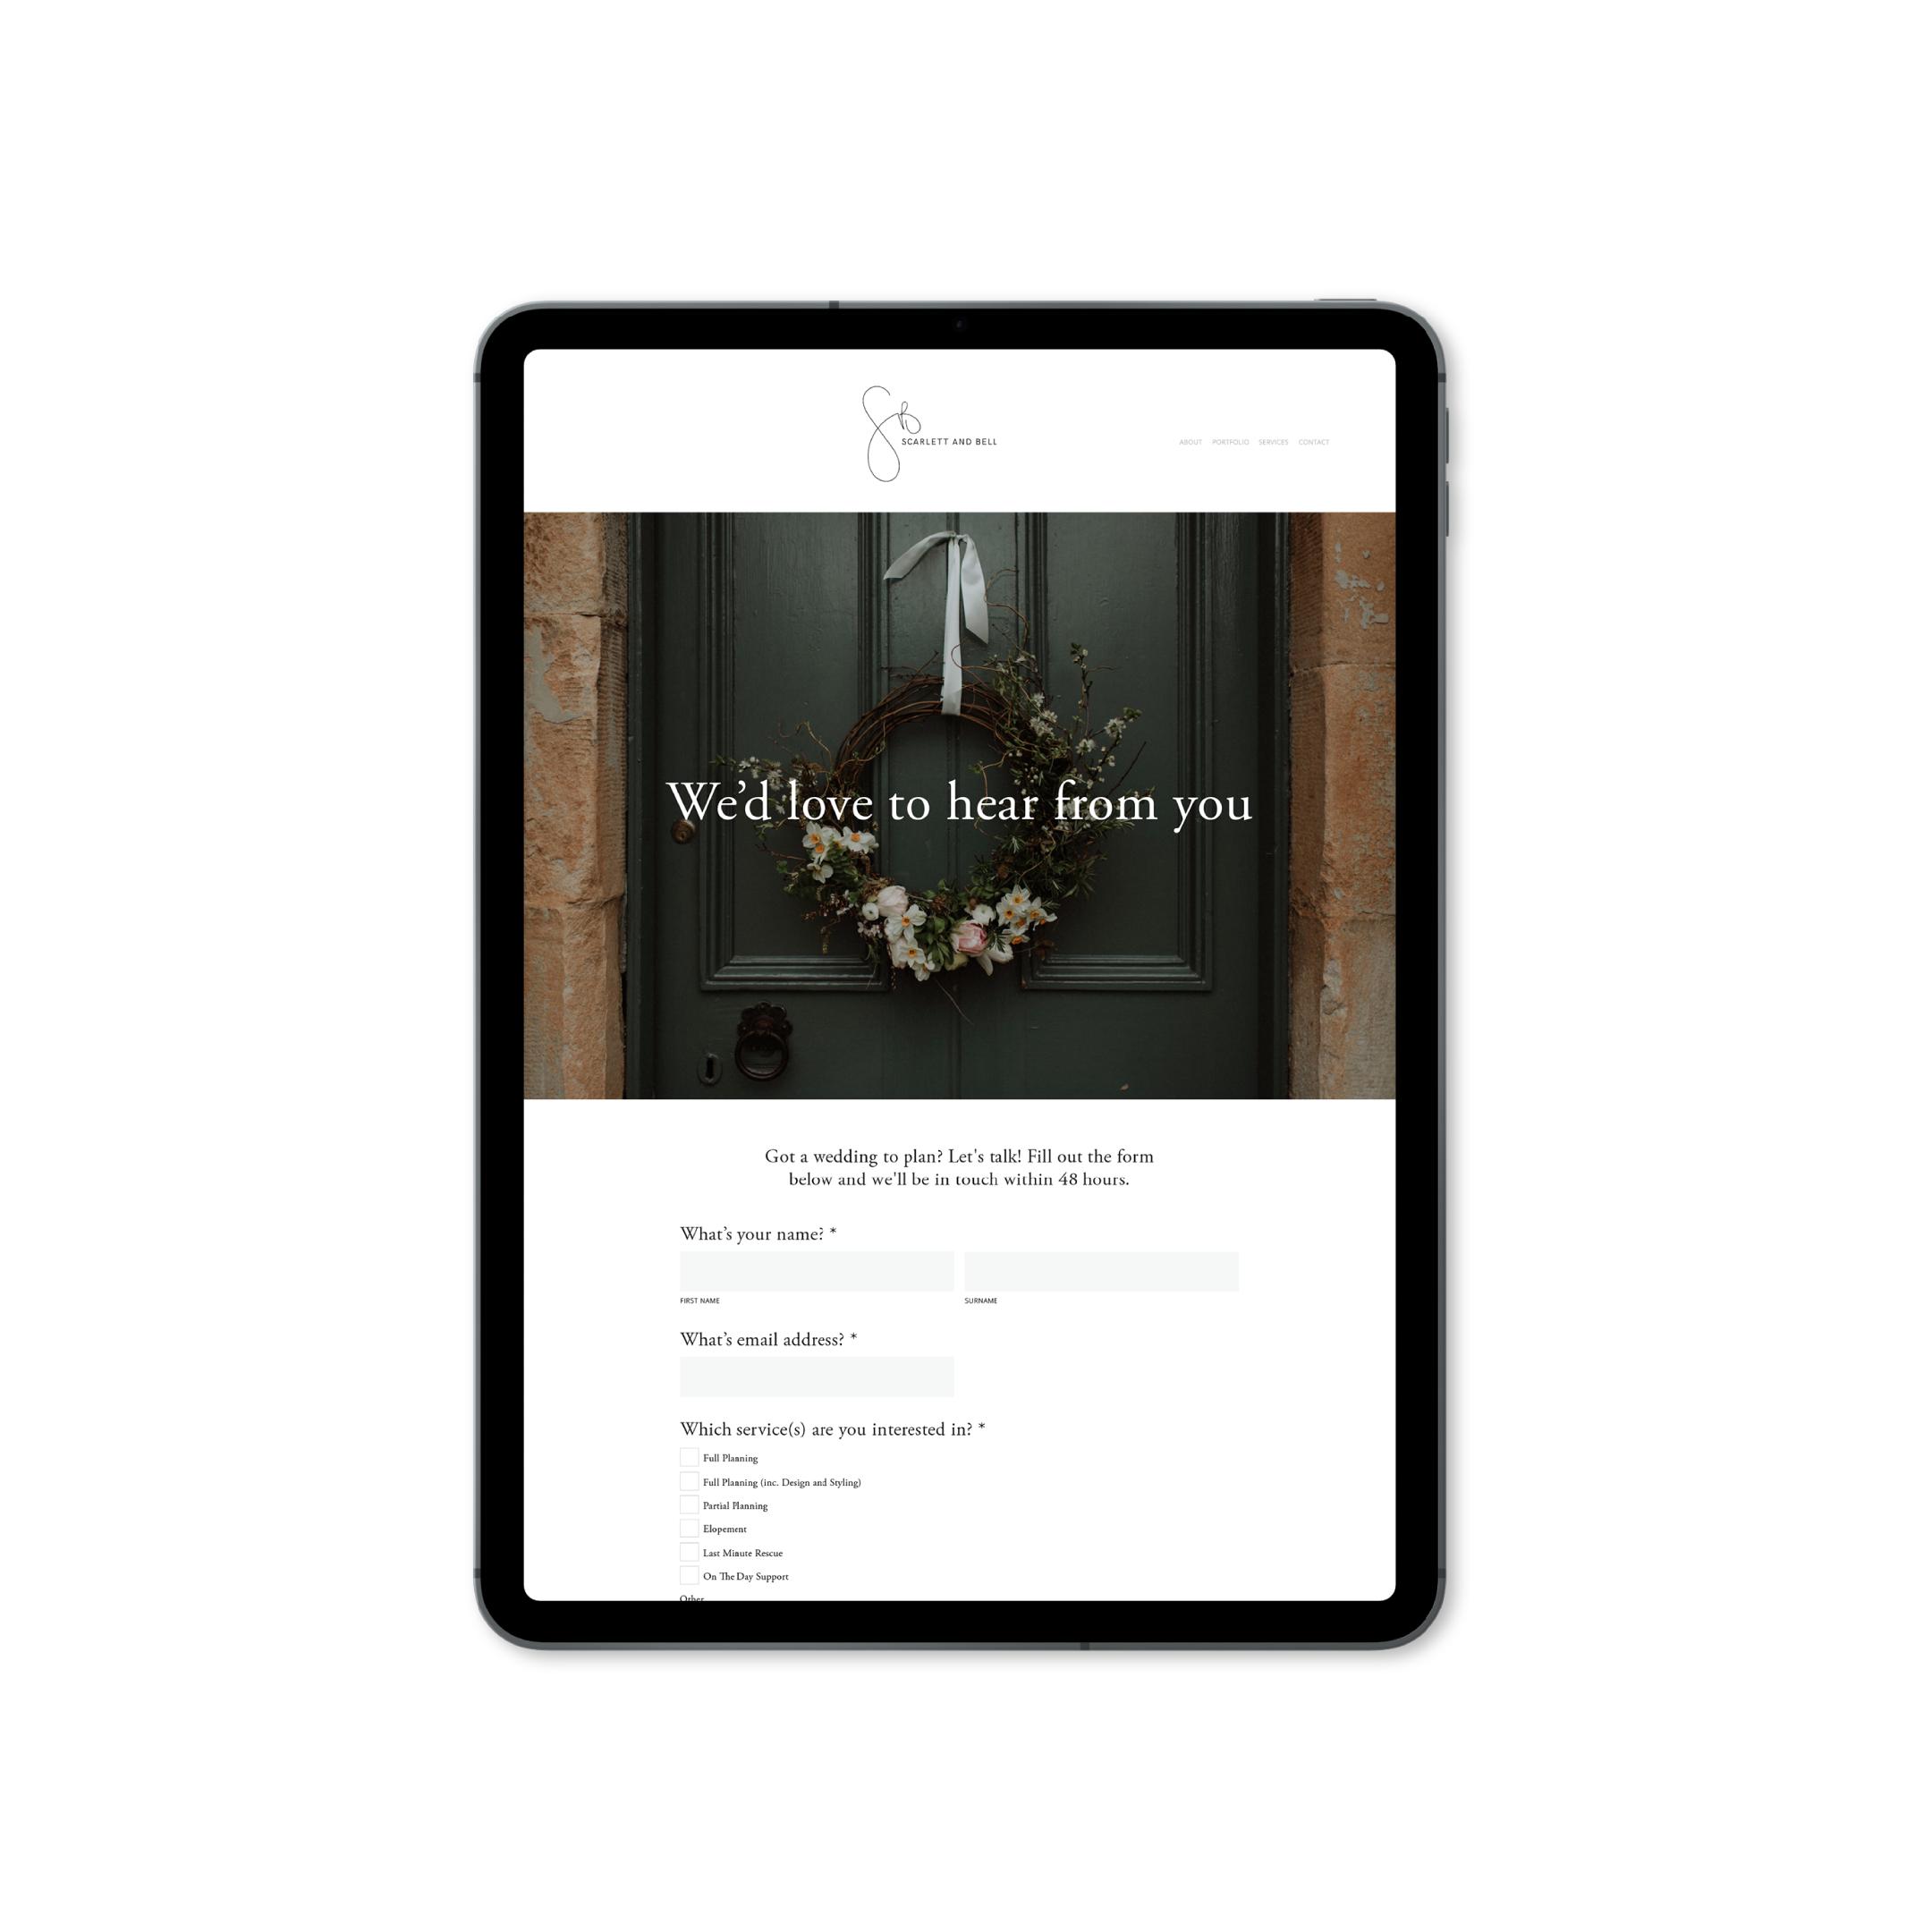 Assets-Website-Portfolio-ScarlettandBell-iPadMockUp-Resized.png